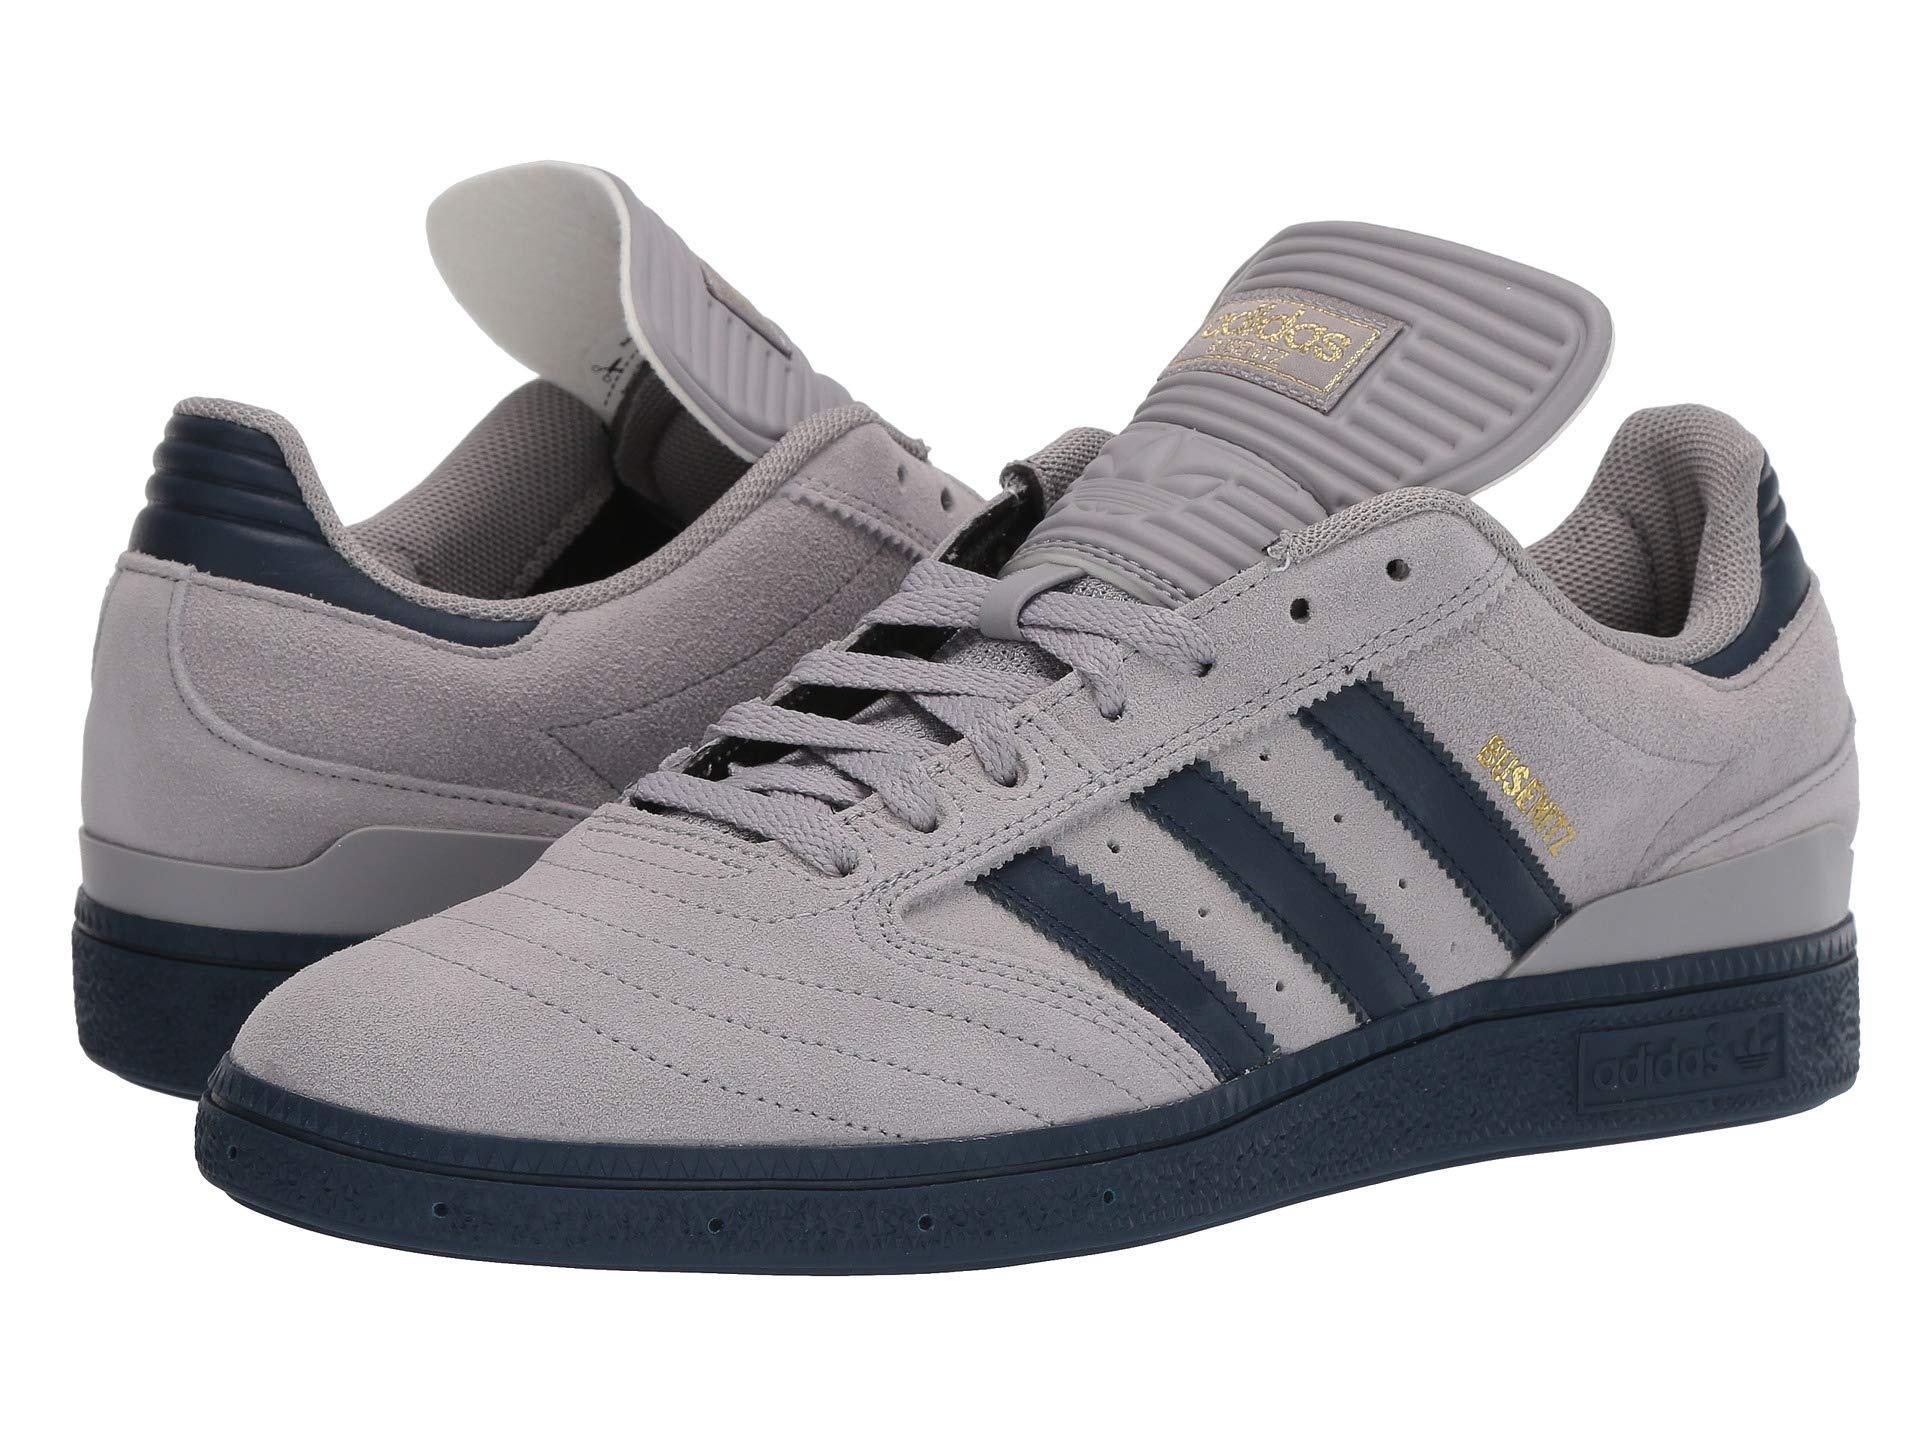 Busenitz Pro (footwear White/collegiate Burgundy/clear Mint) Men's Skate Shoes